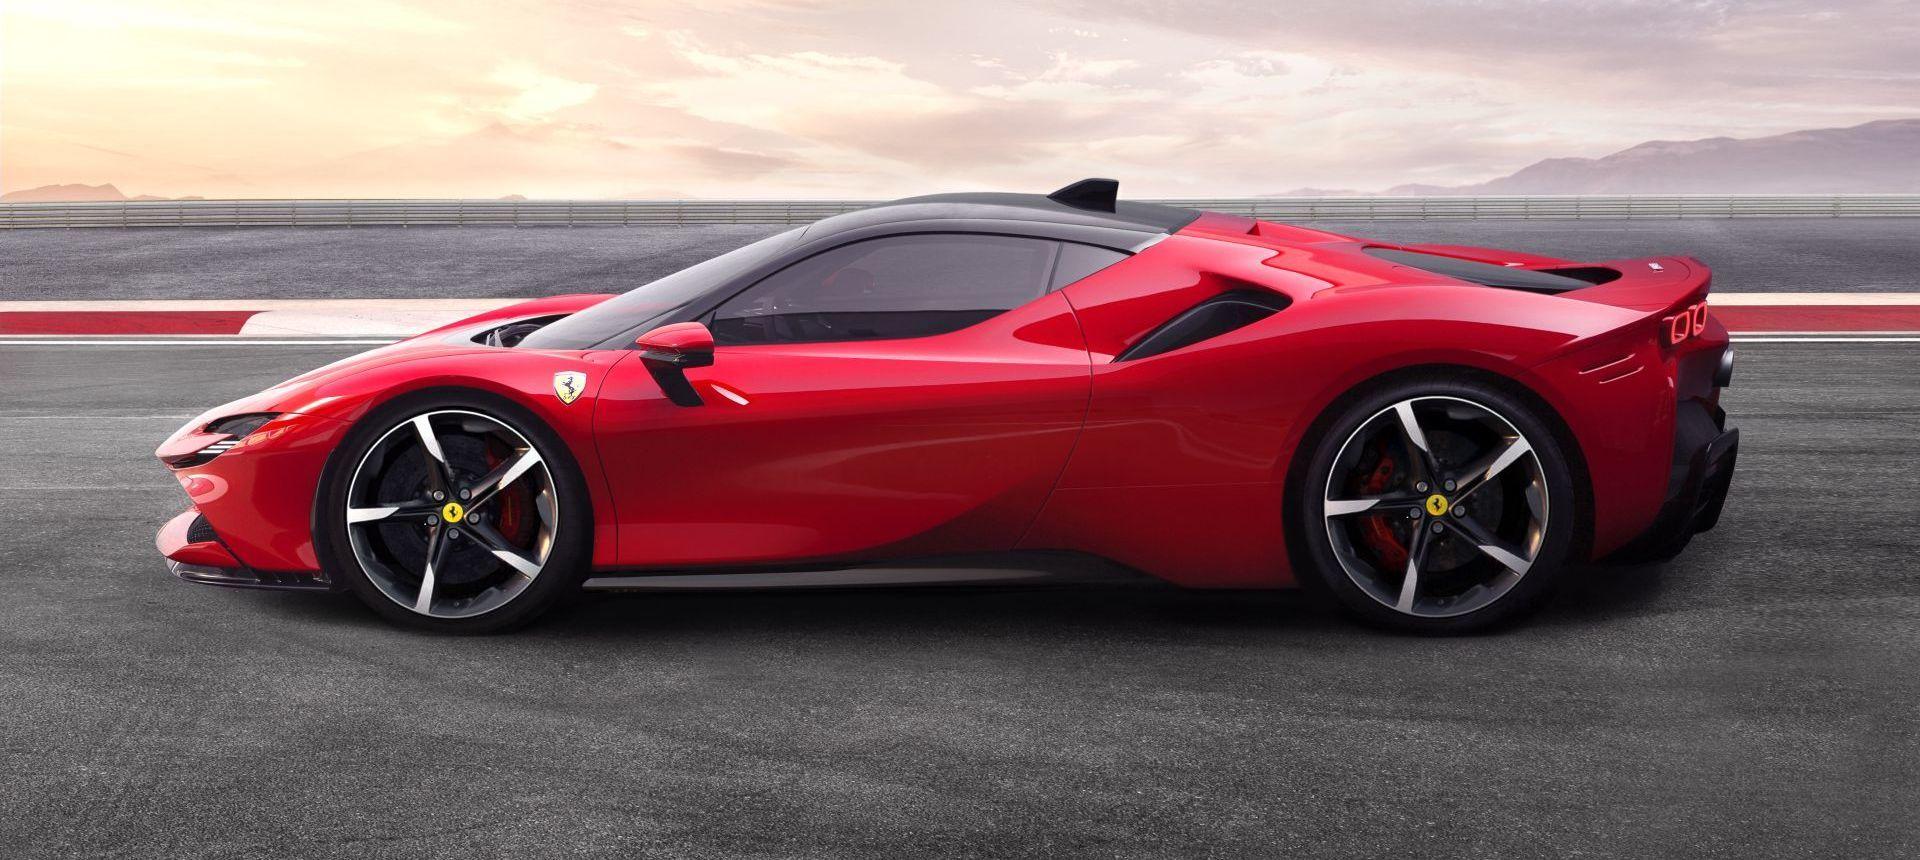 Ferrari Sf90 Stradale 2020 P